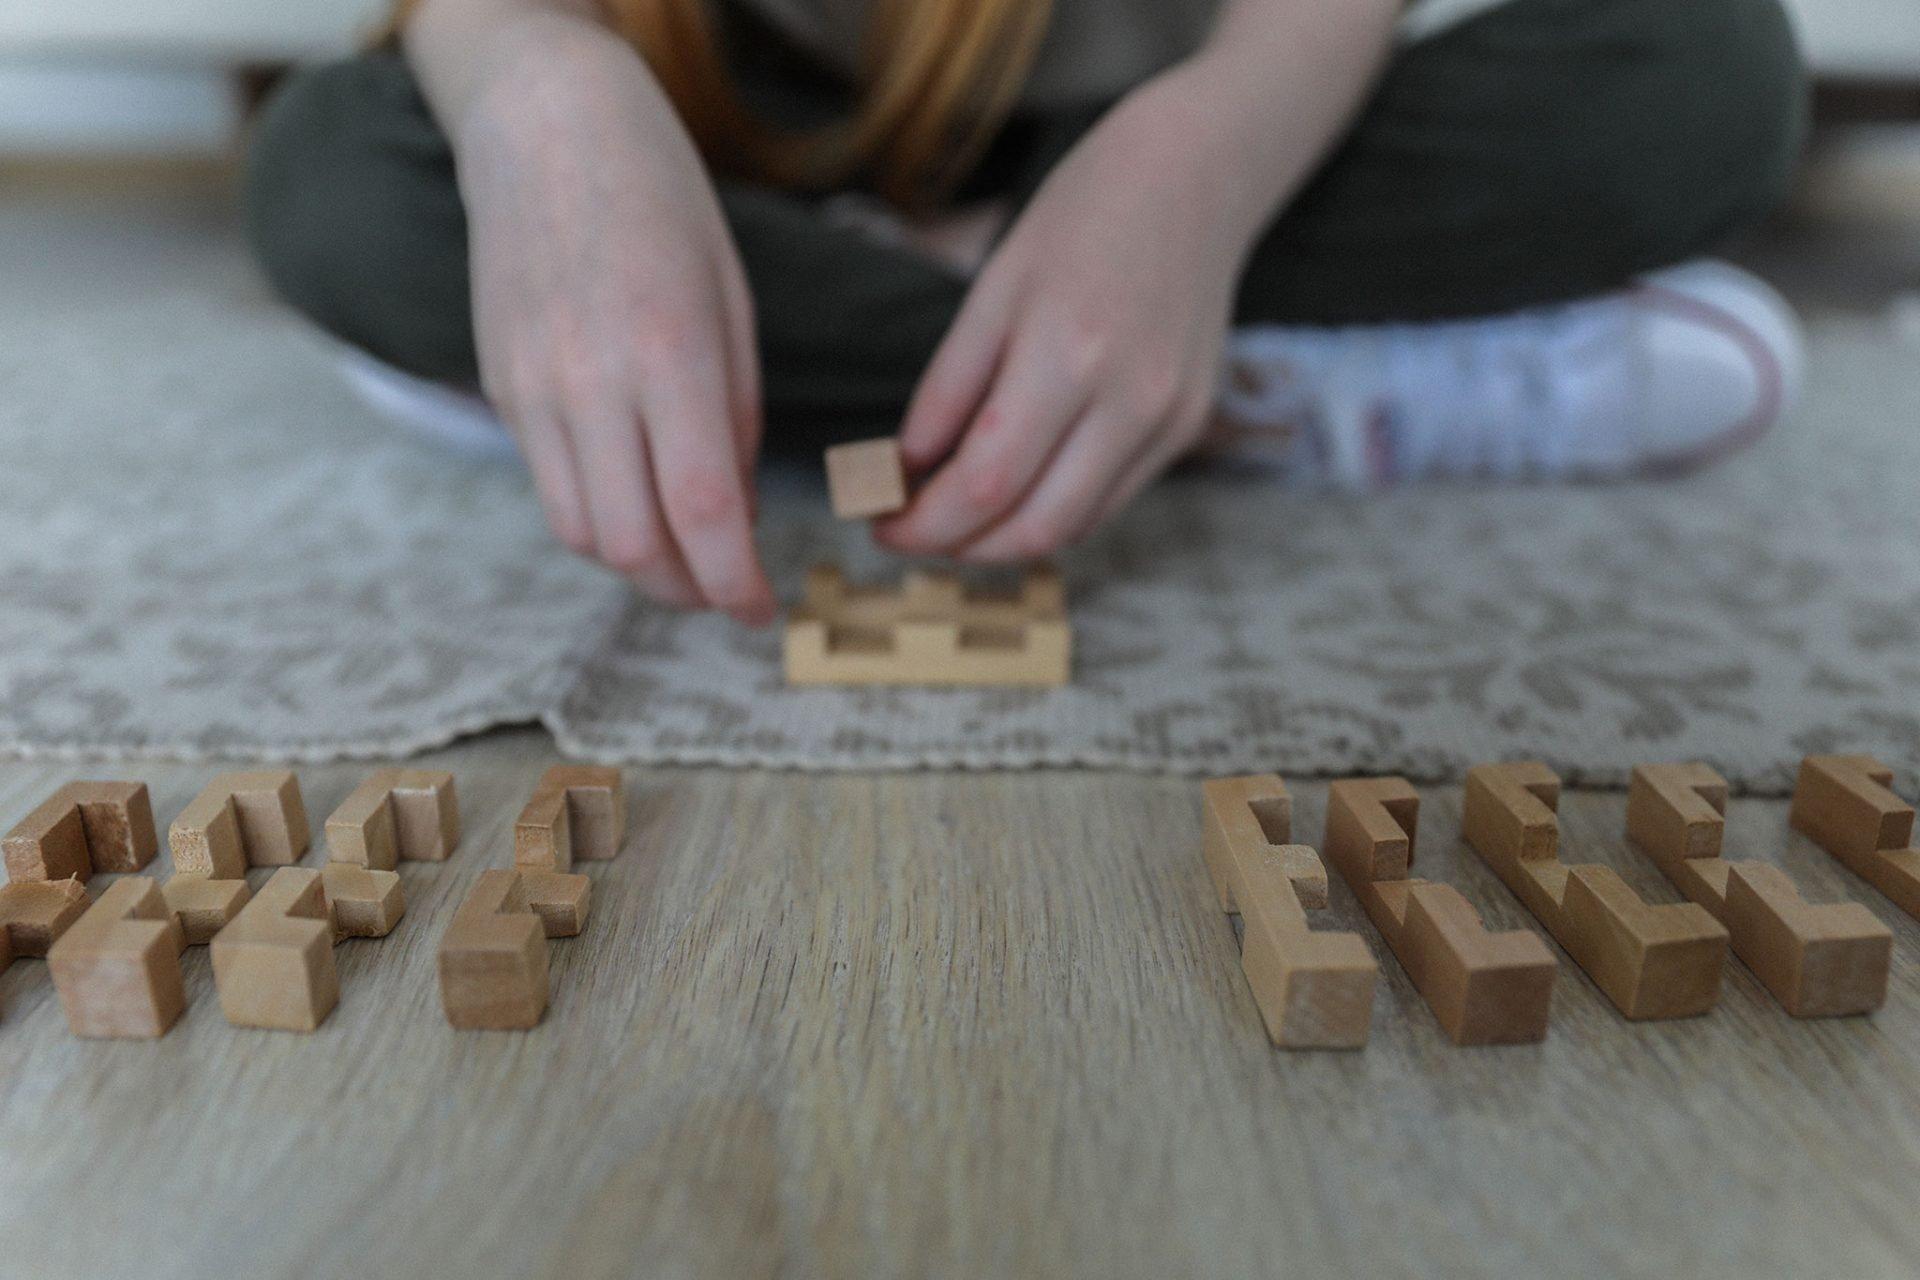 Gemi Bertran's Blog Introducing The 30 Day Challenge